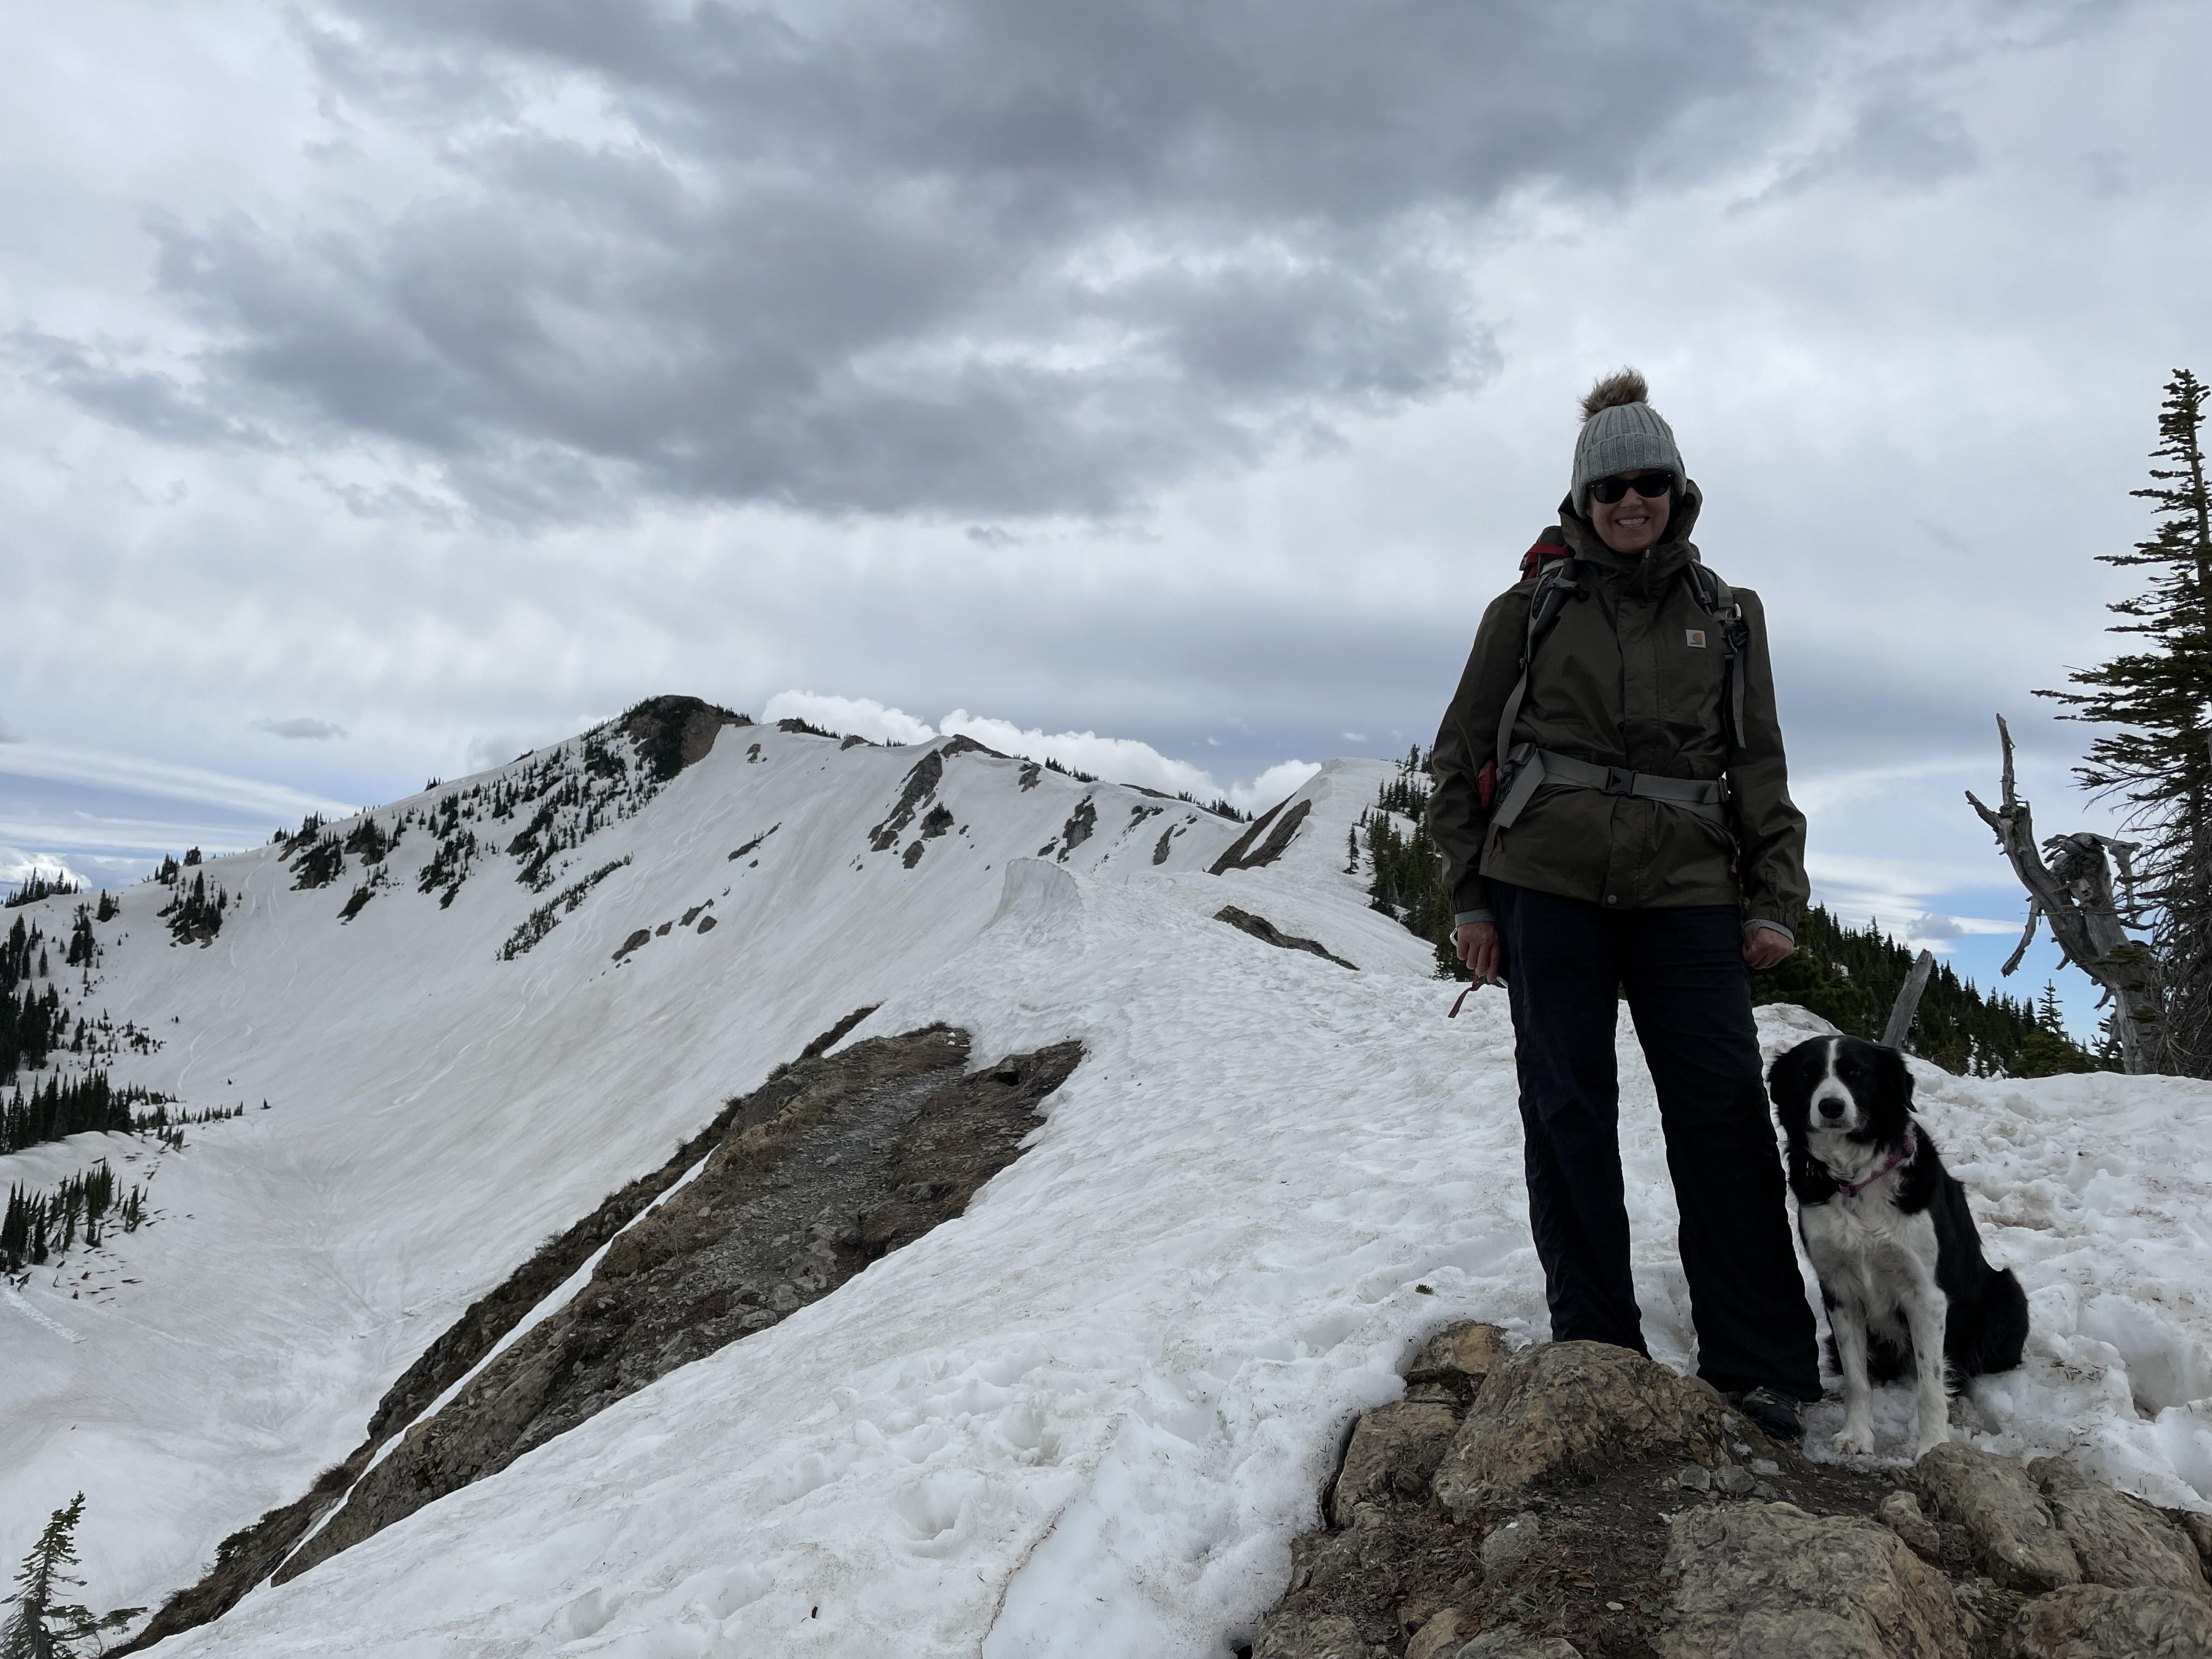 The snowy summit.